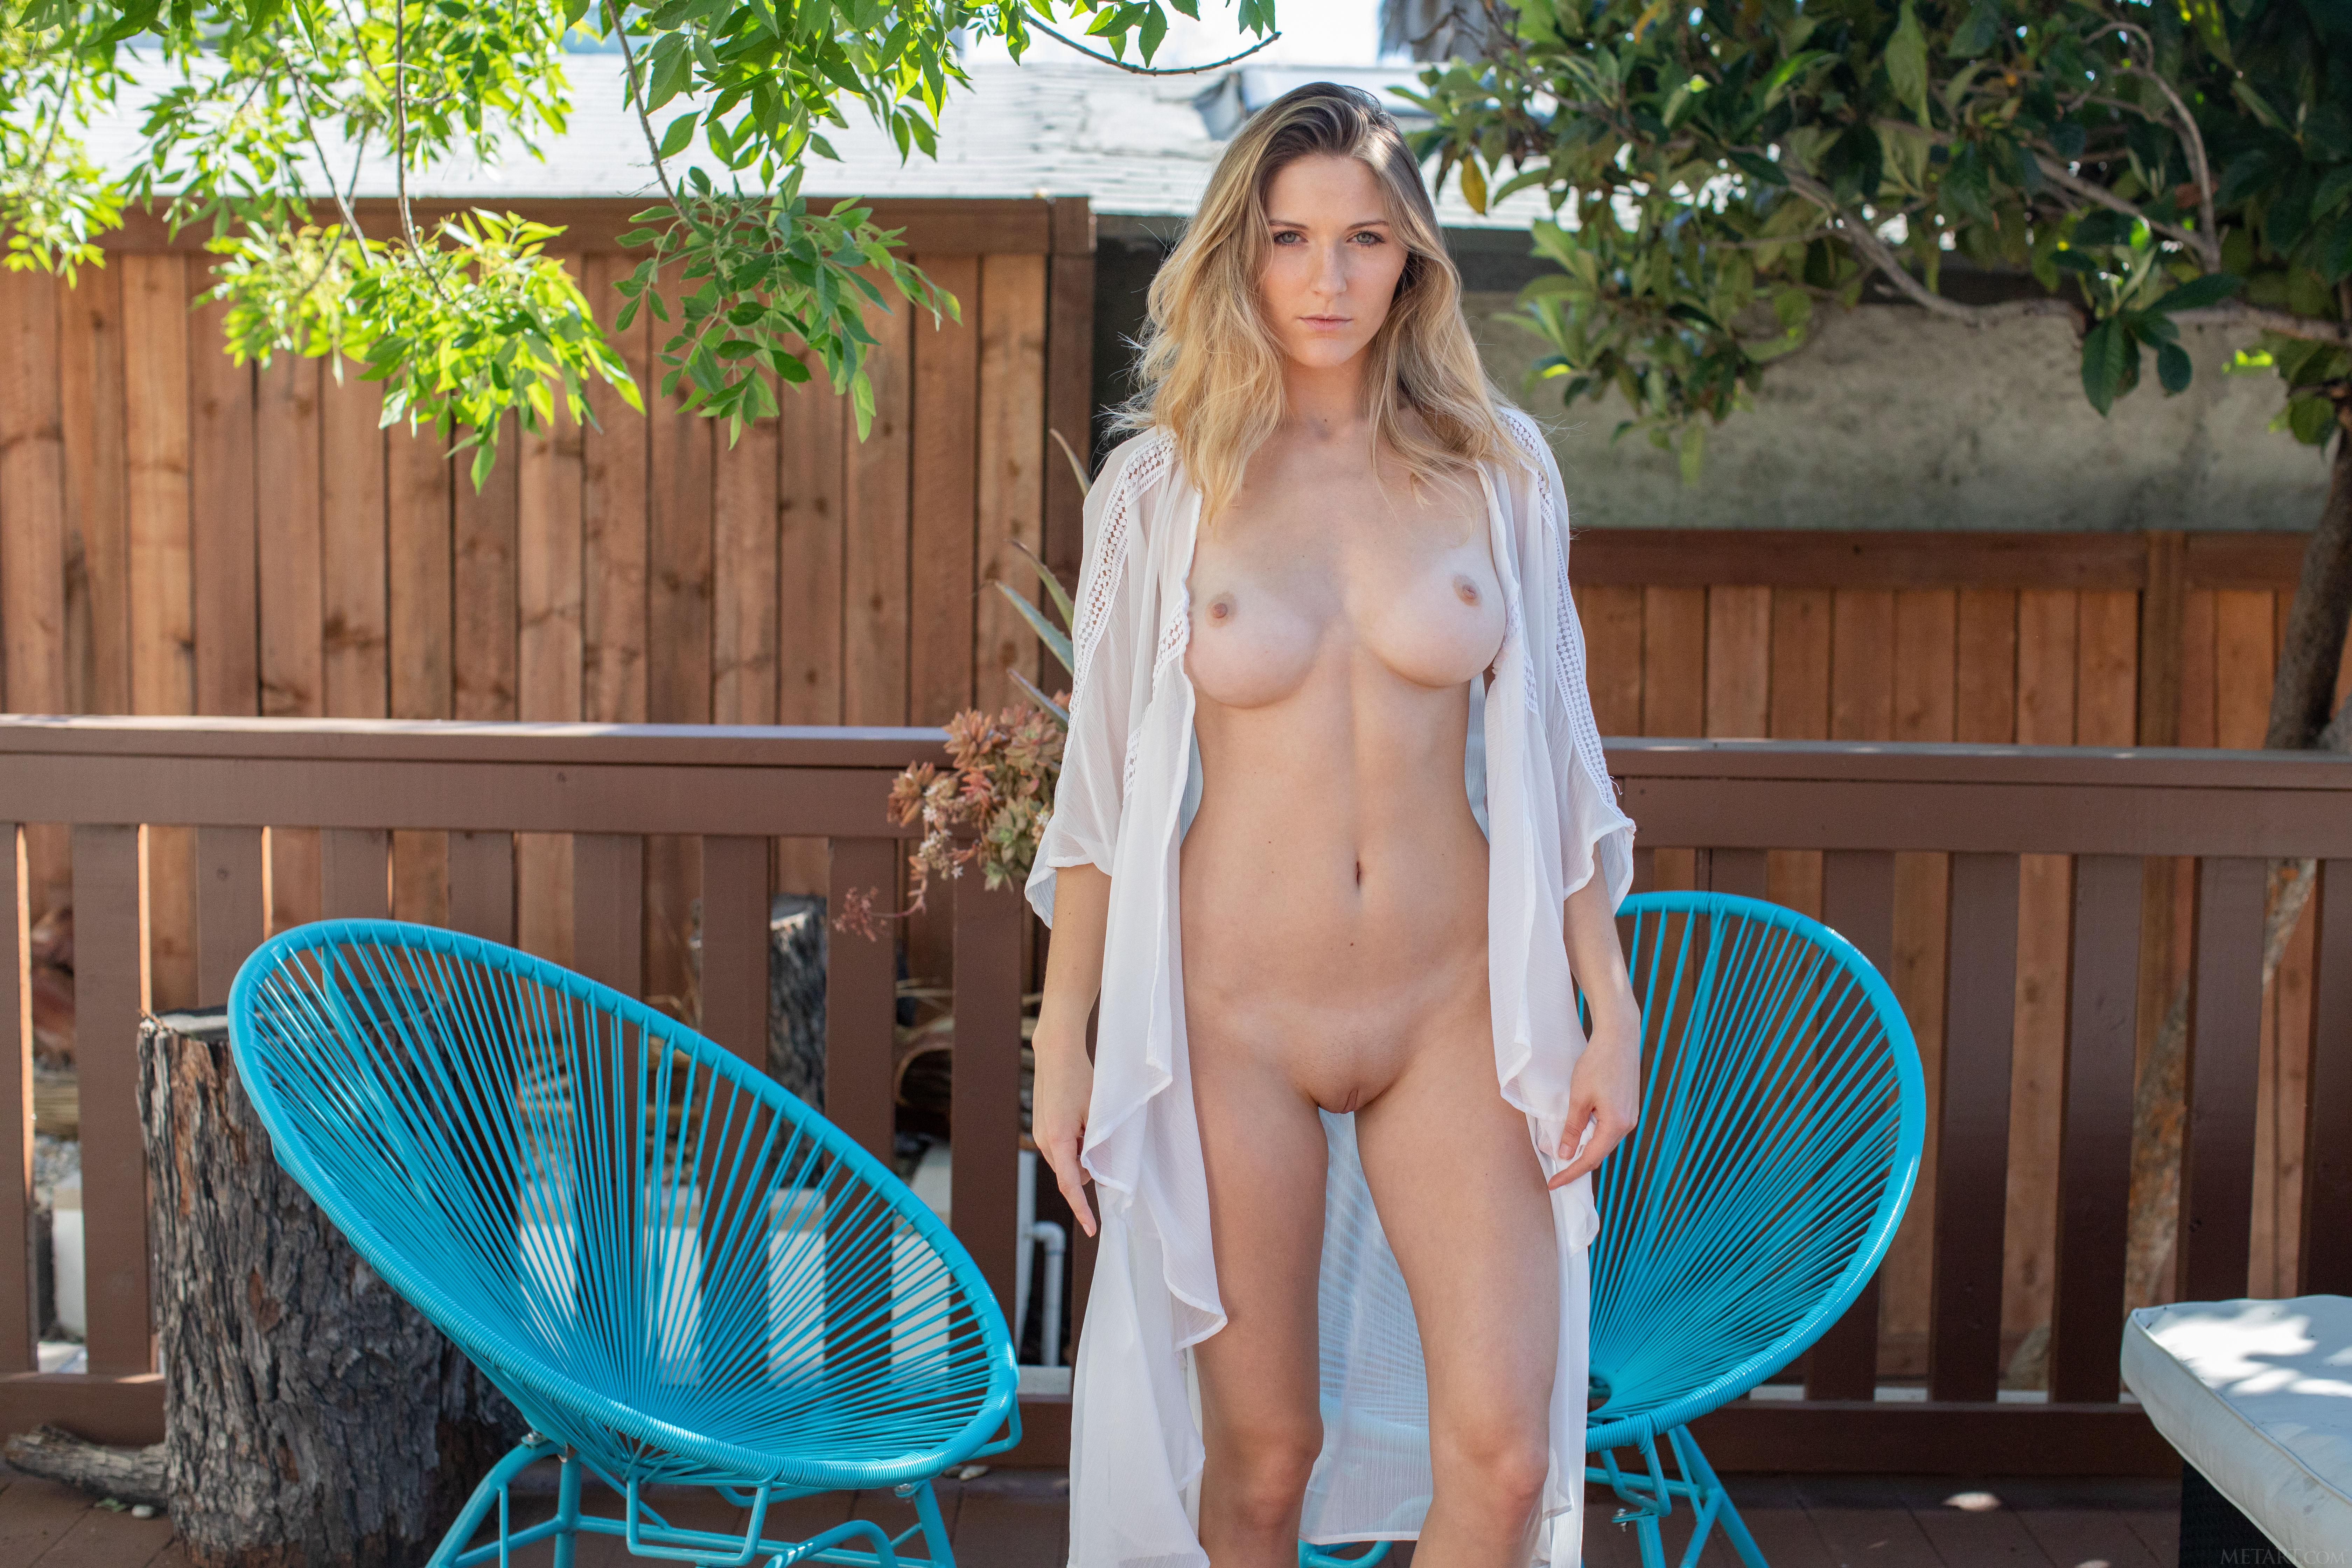 Nude on patio